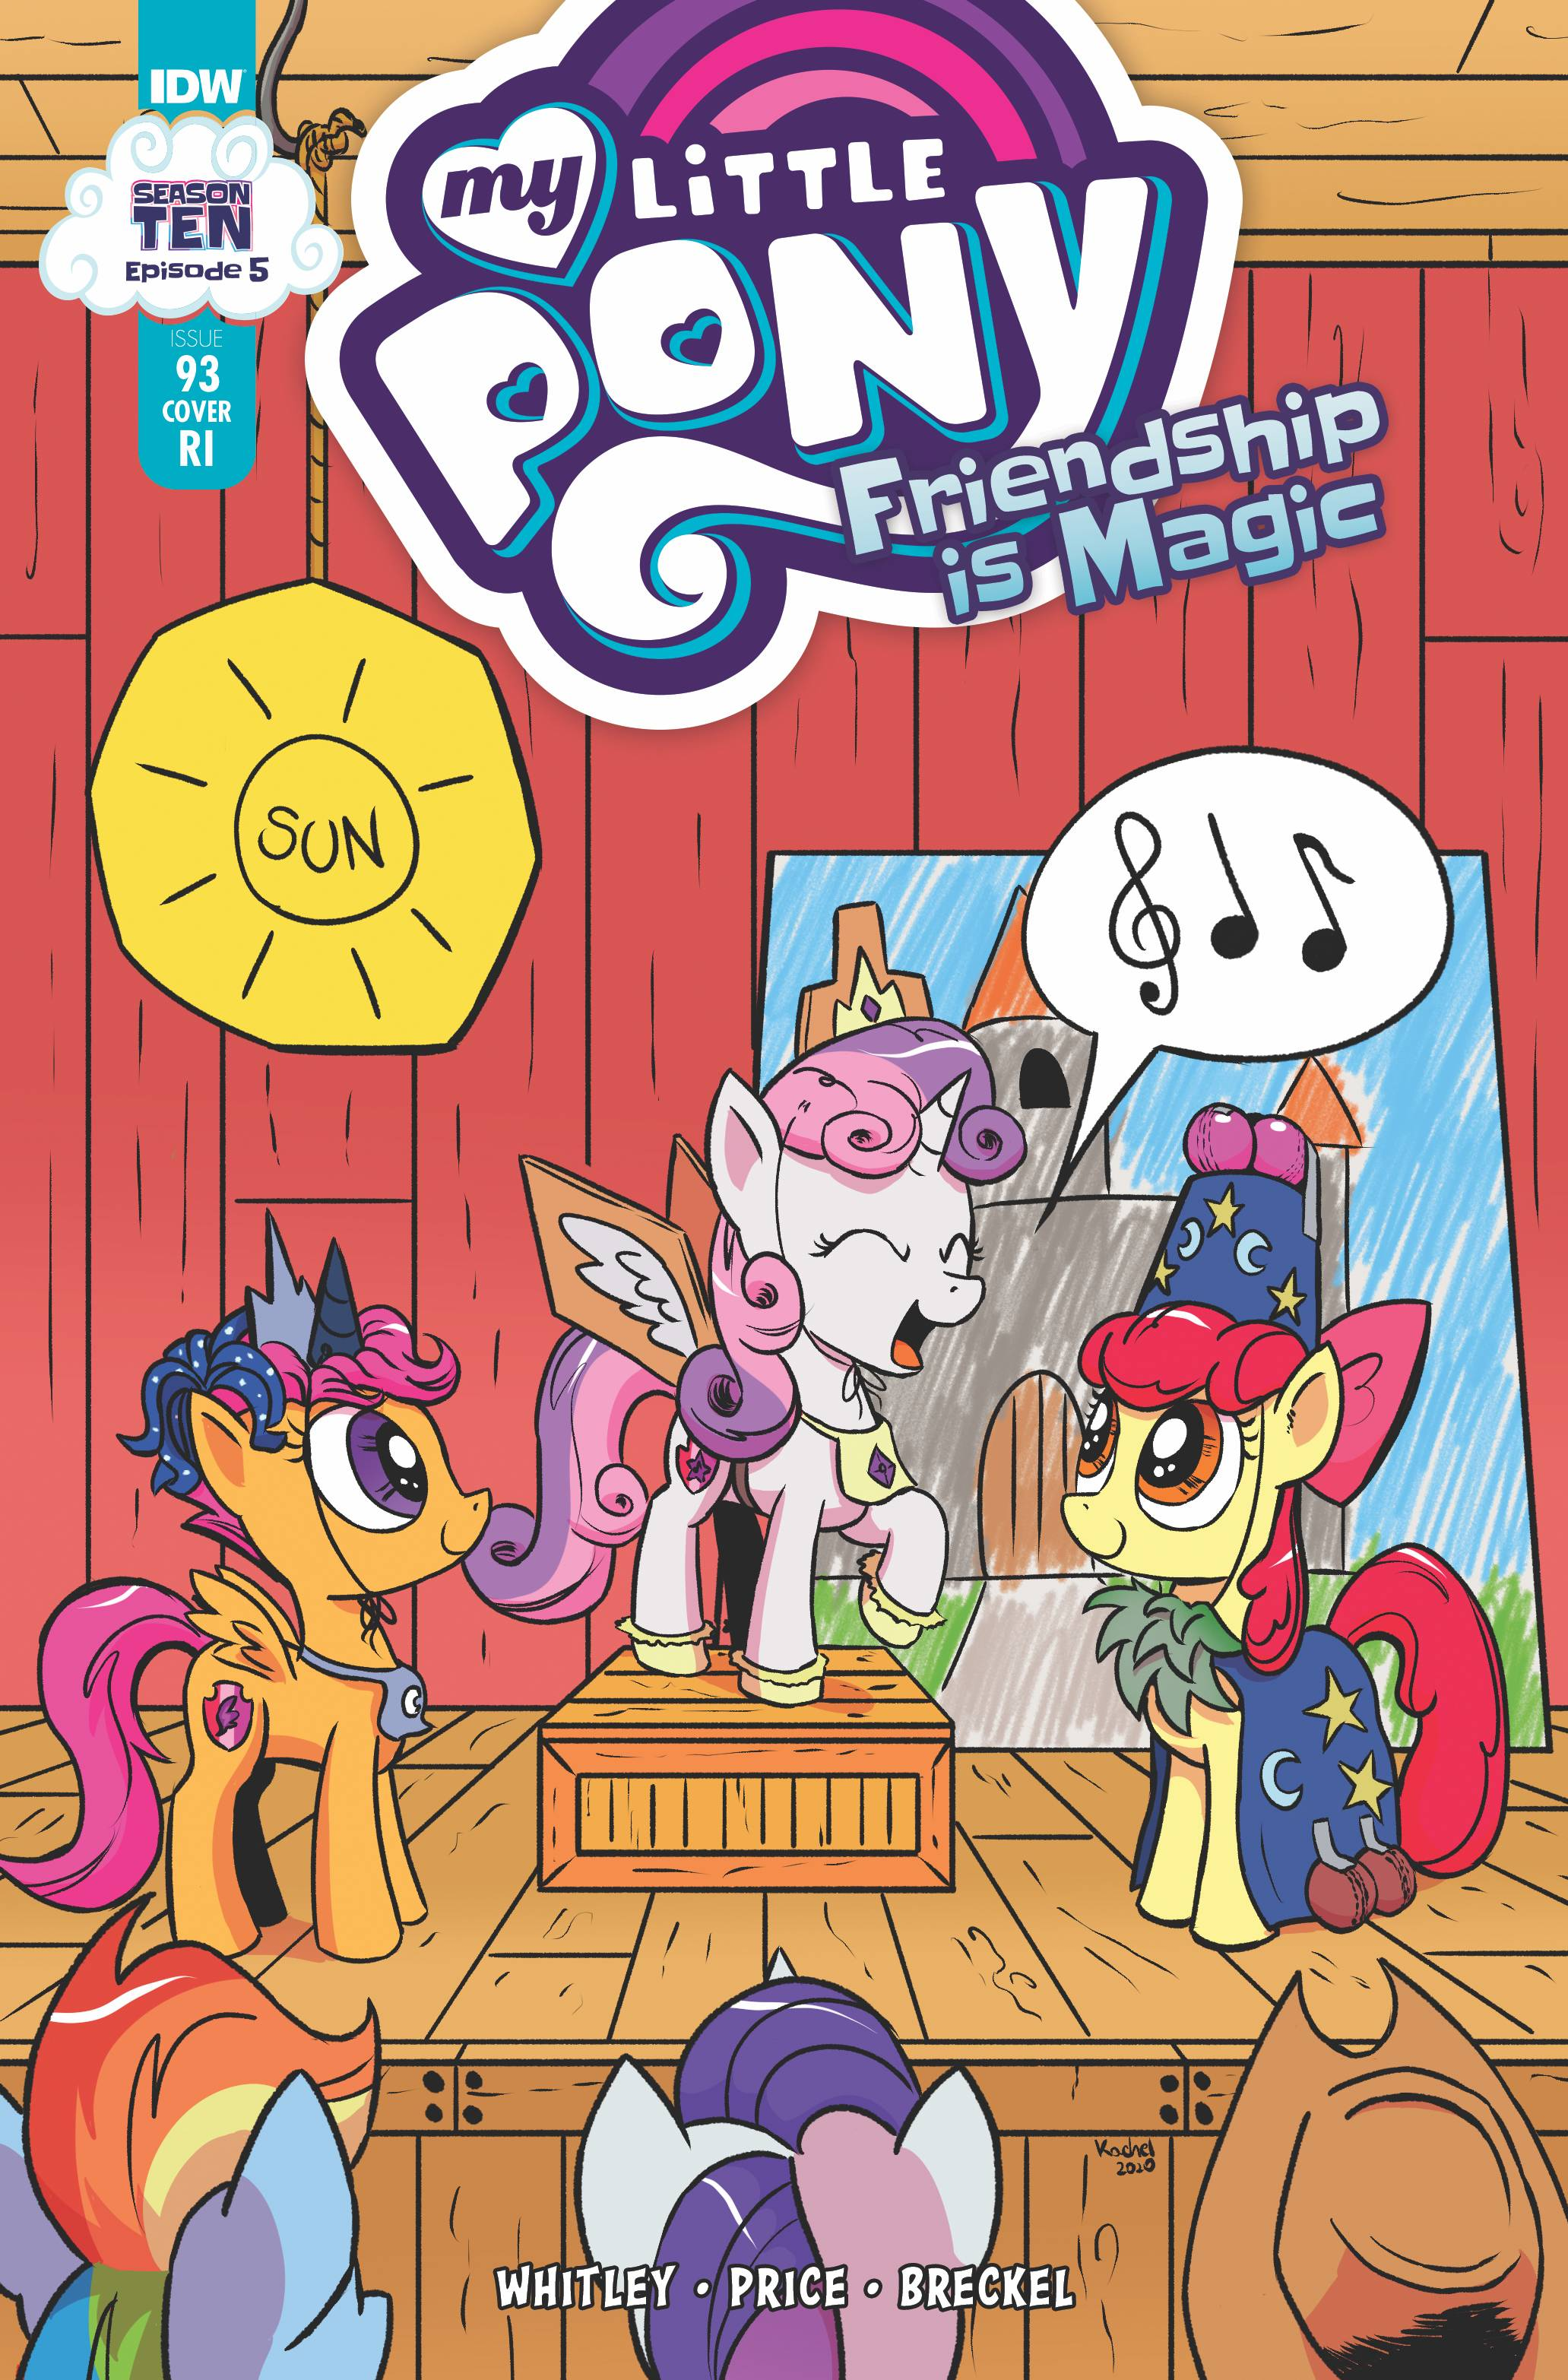 MY LITTLE PONY FRIENDSHIP IS MAGIC #93 10 COPY INCV KACHEL (